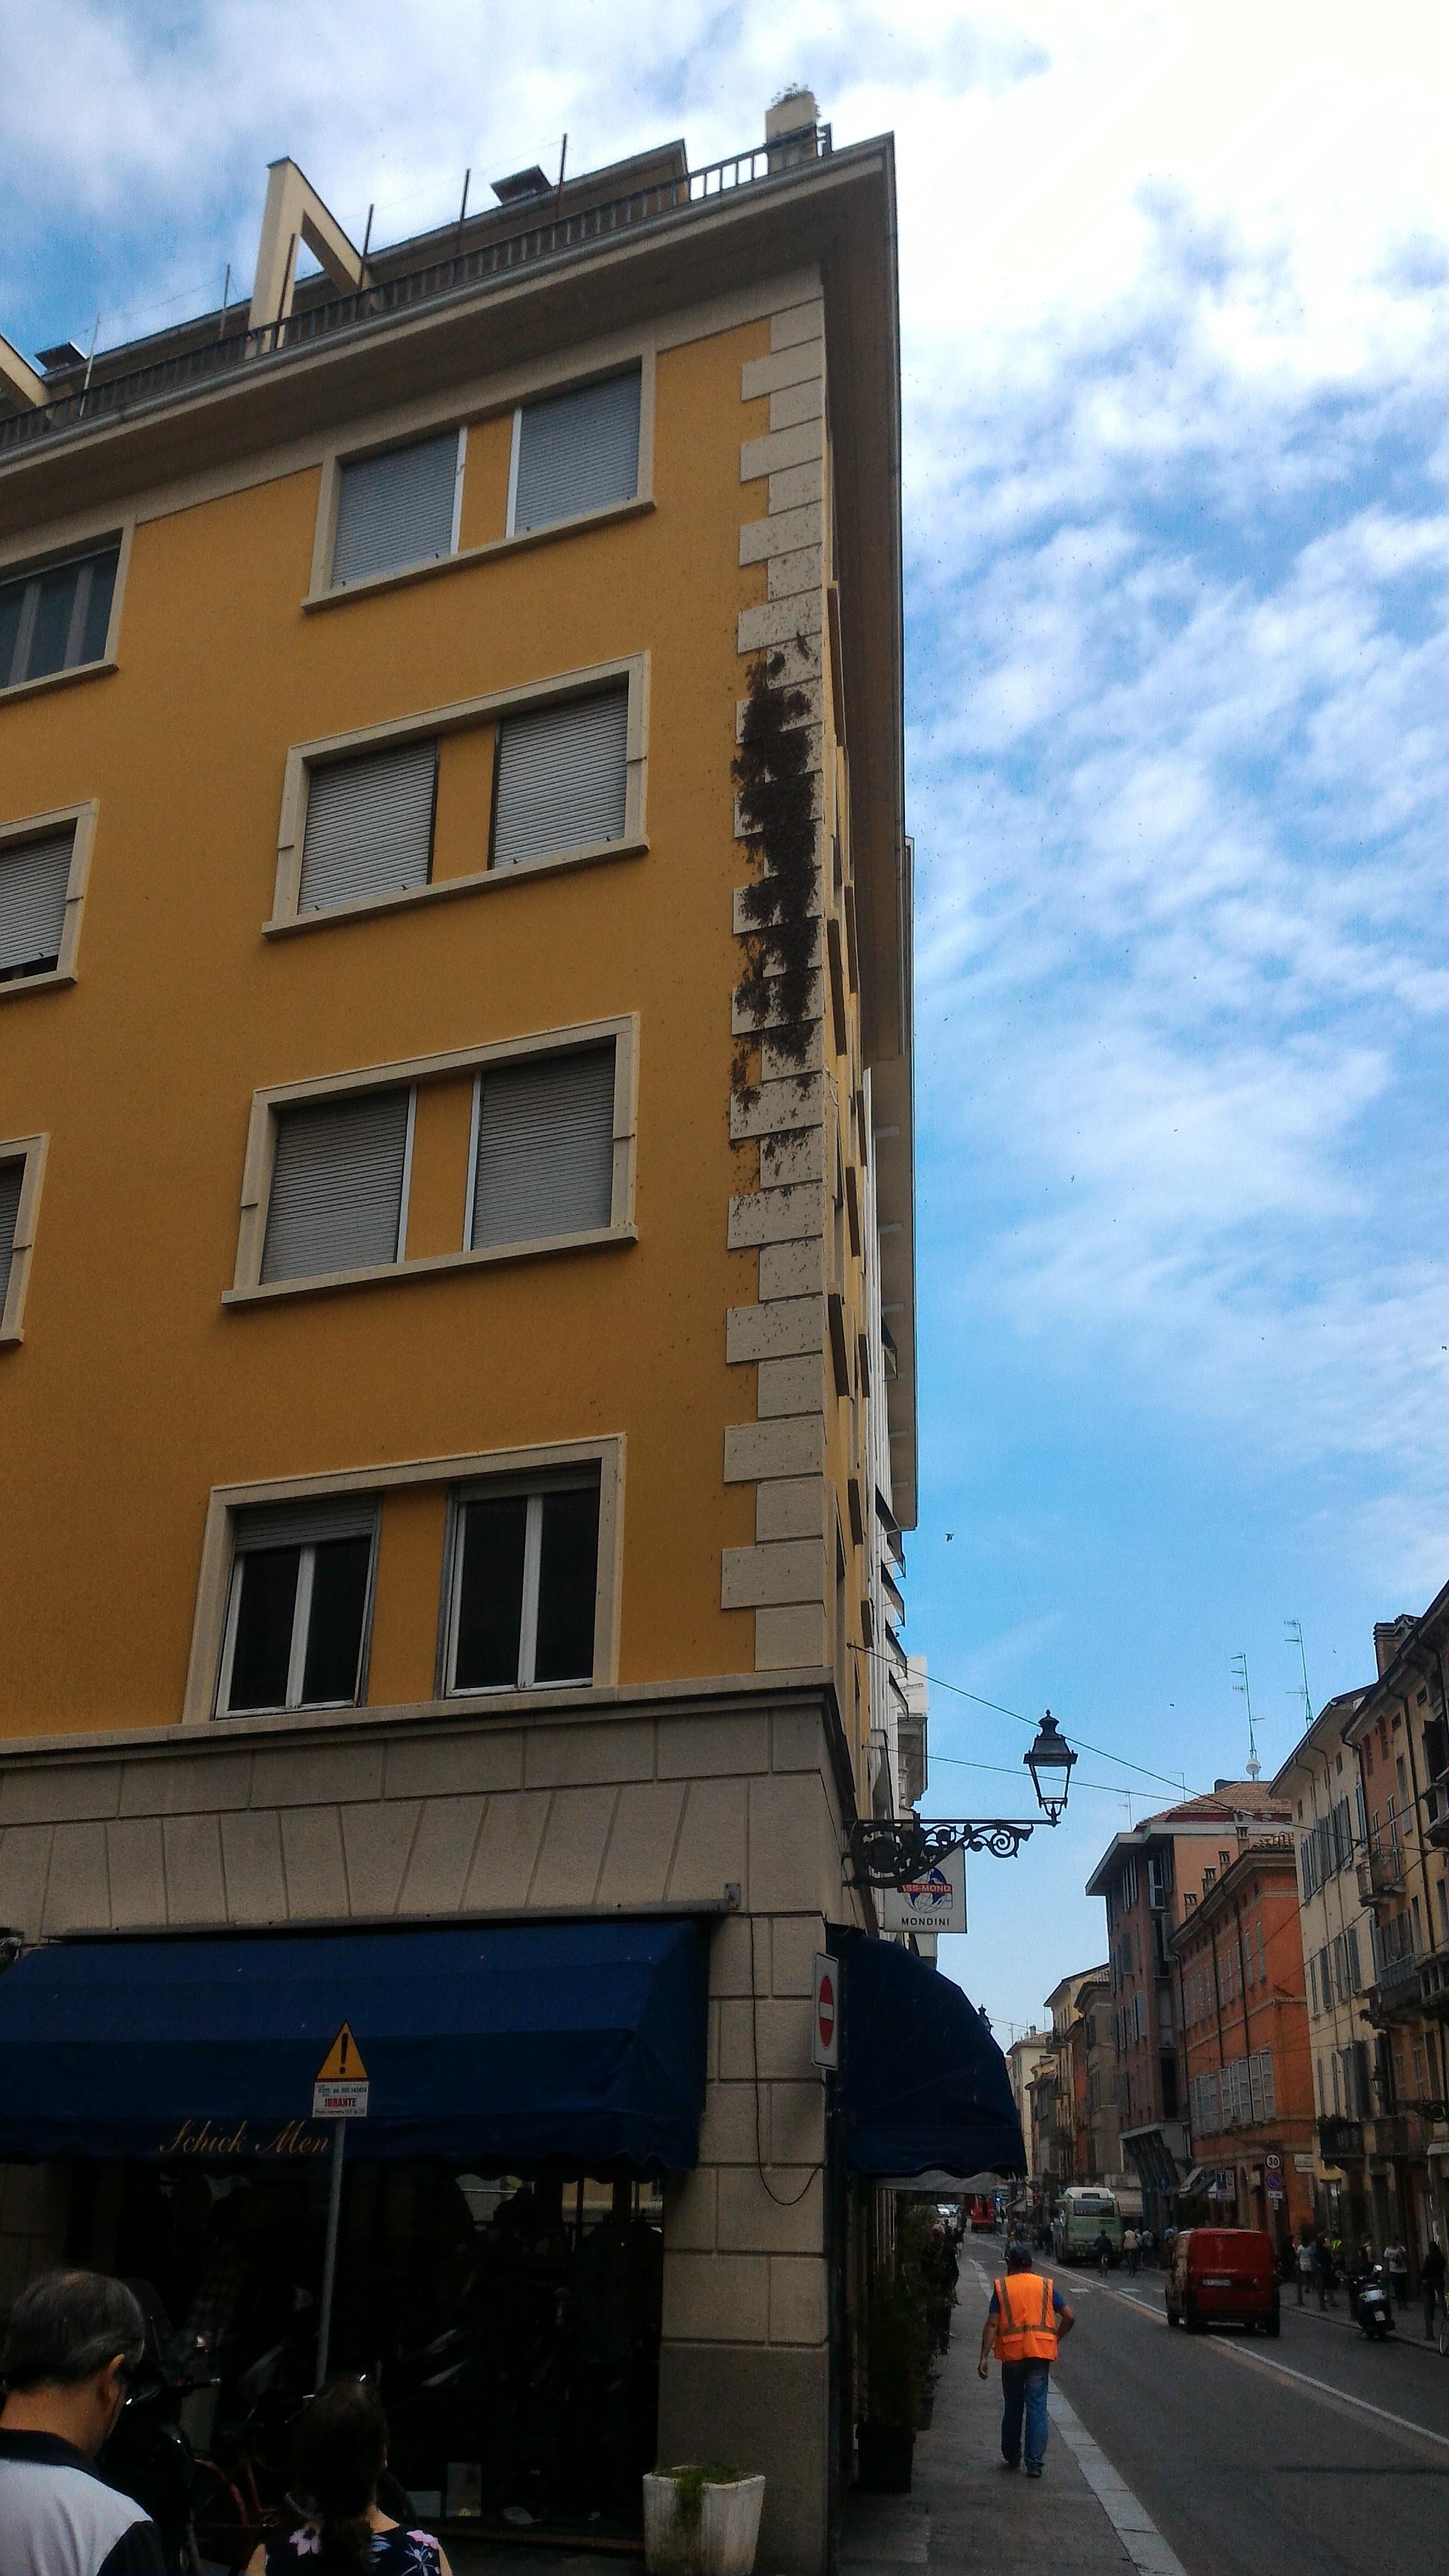 Free Unsplash photo from Giuseppe Montali